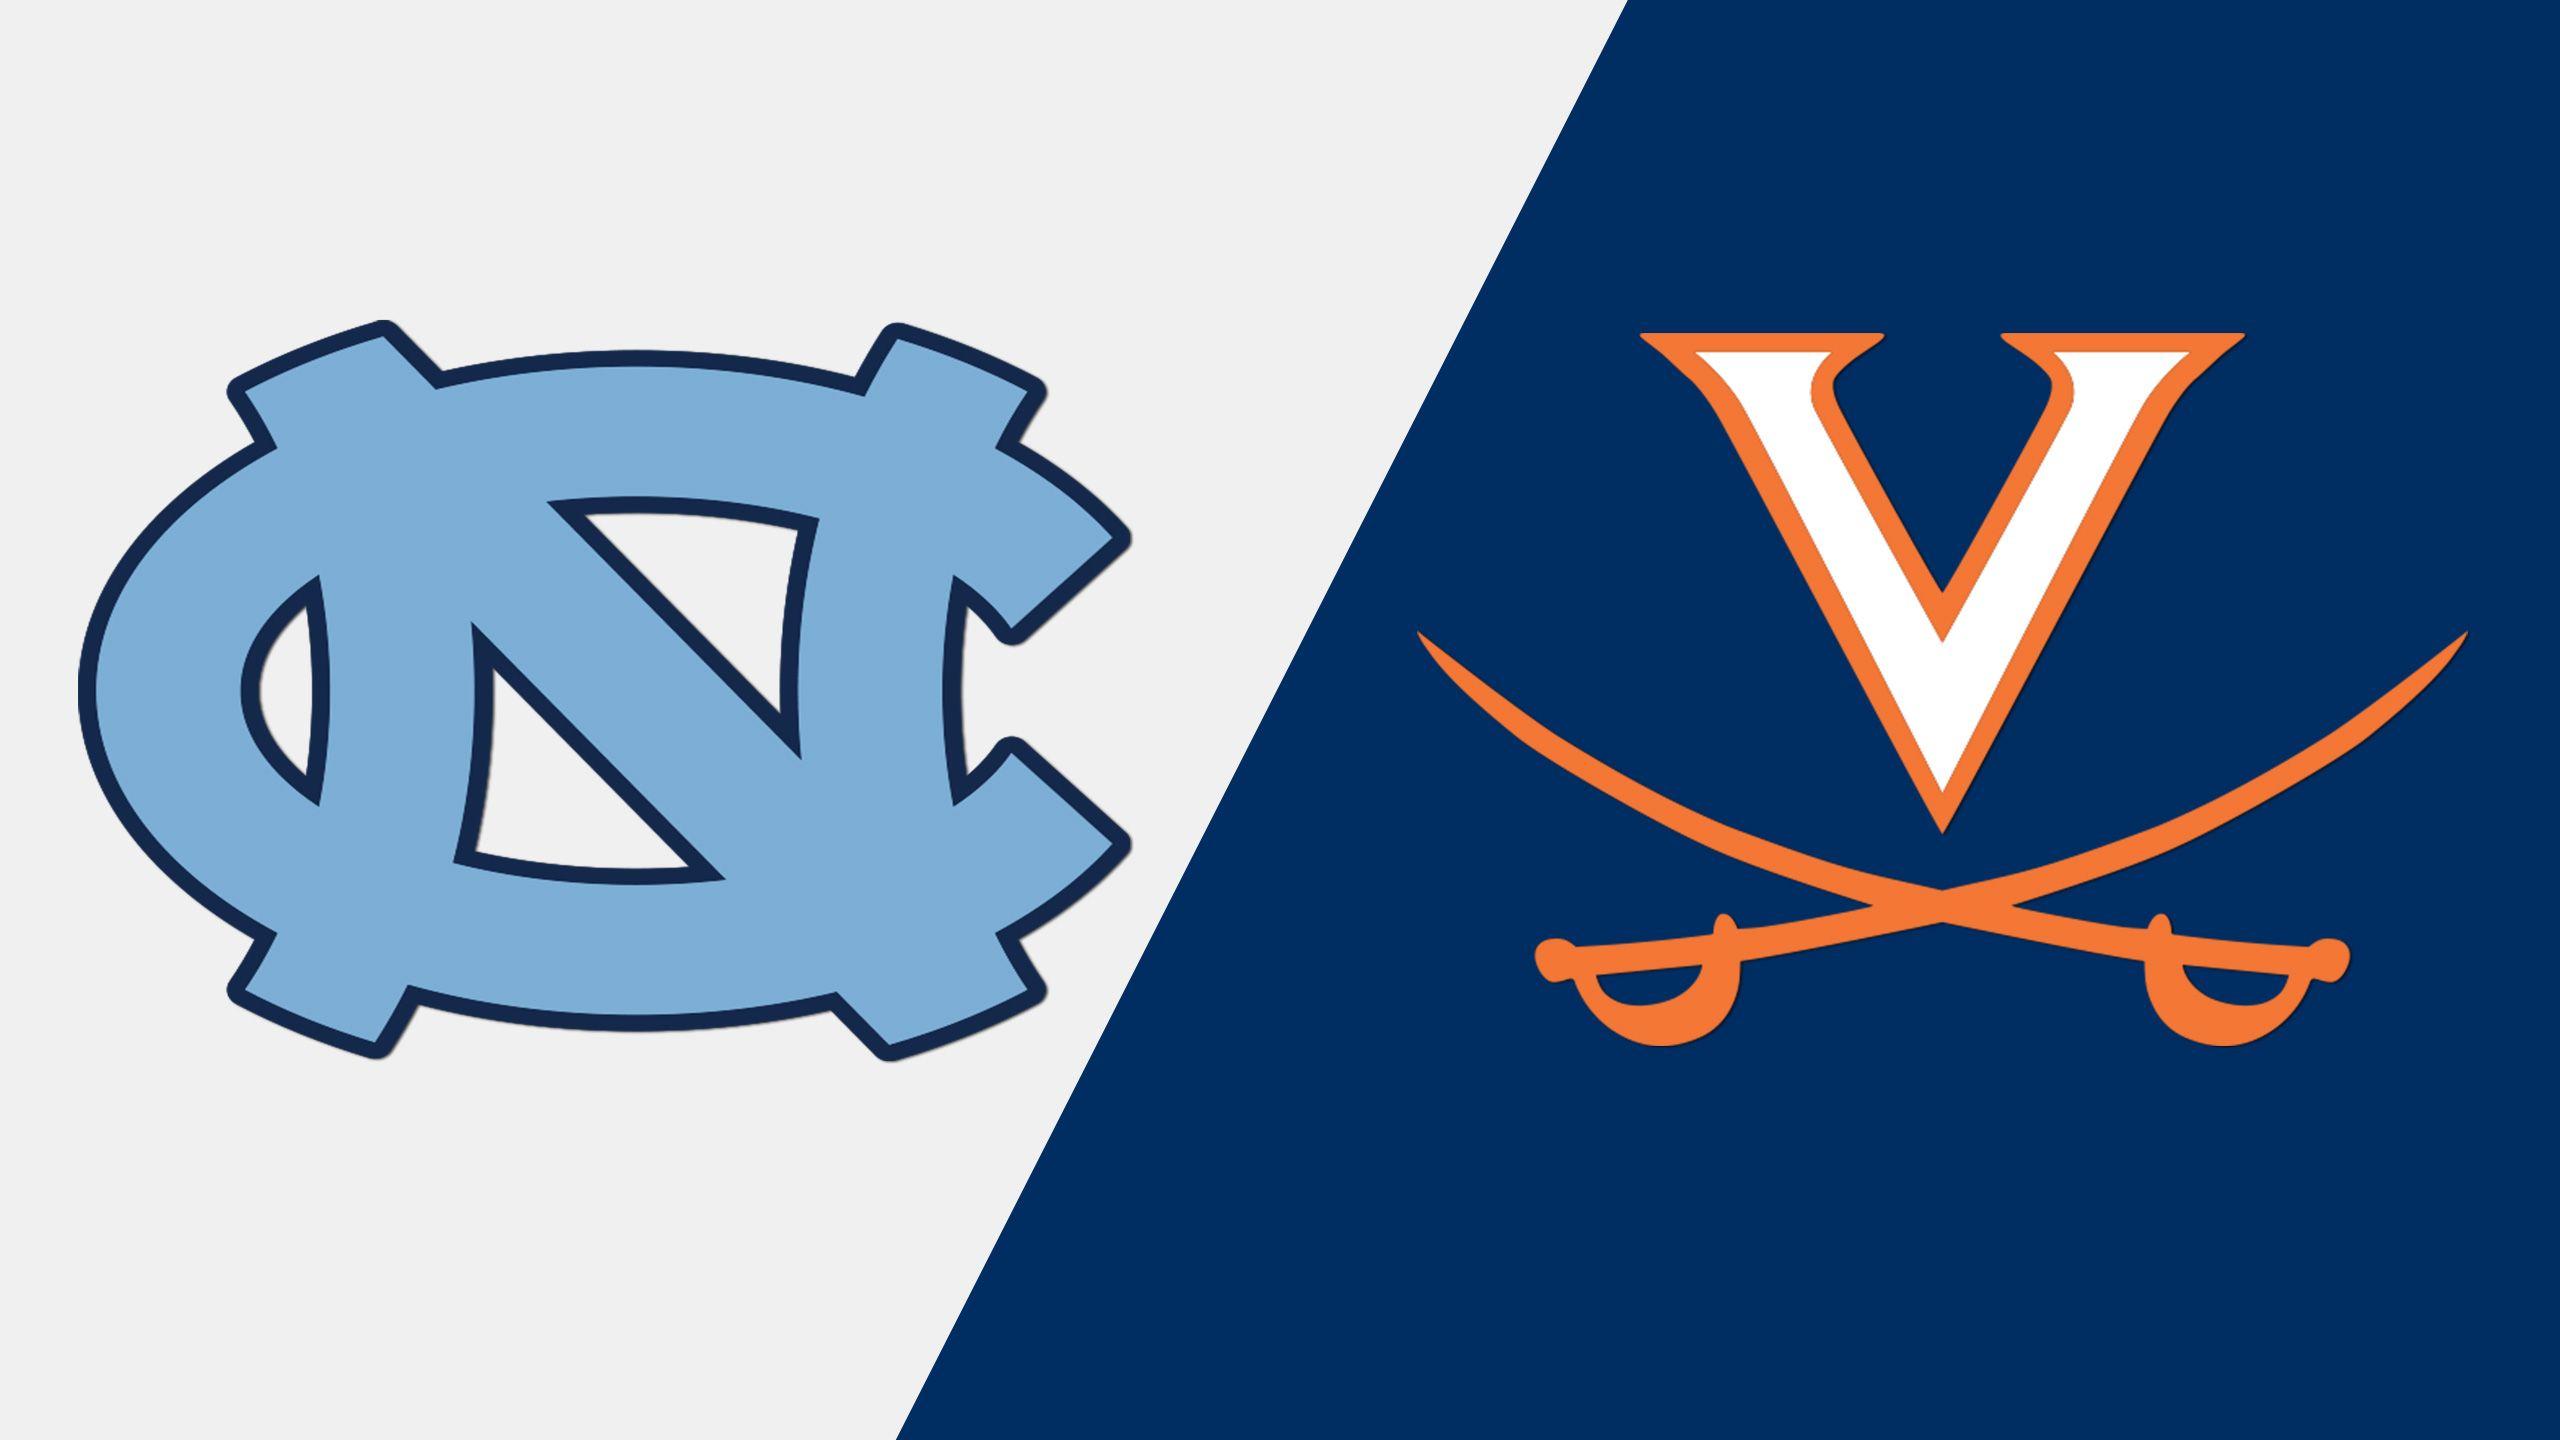 #22 North Carolina vs. Virginia (Baseball)